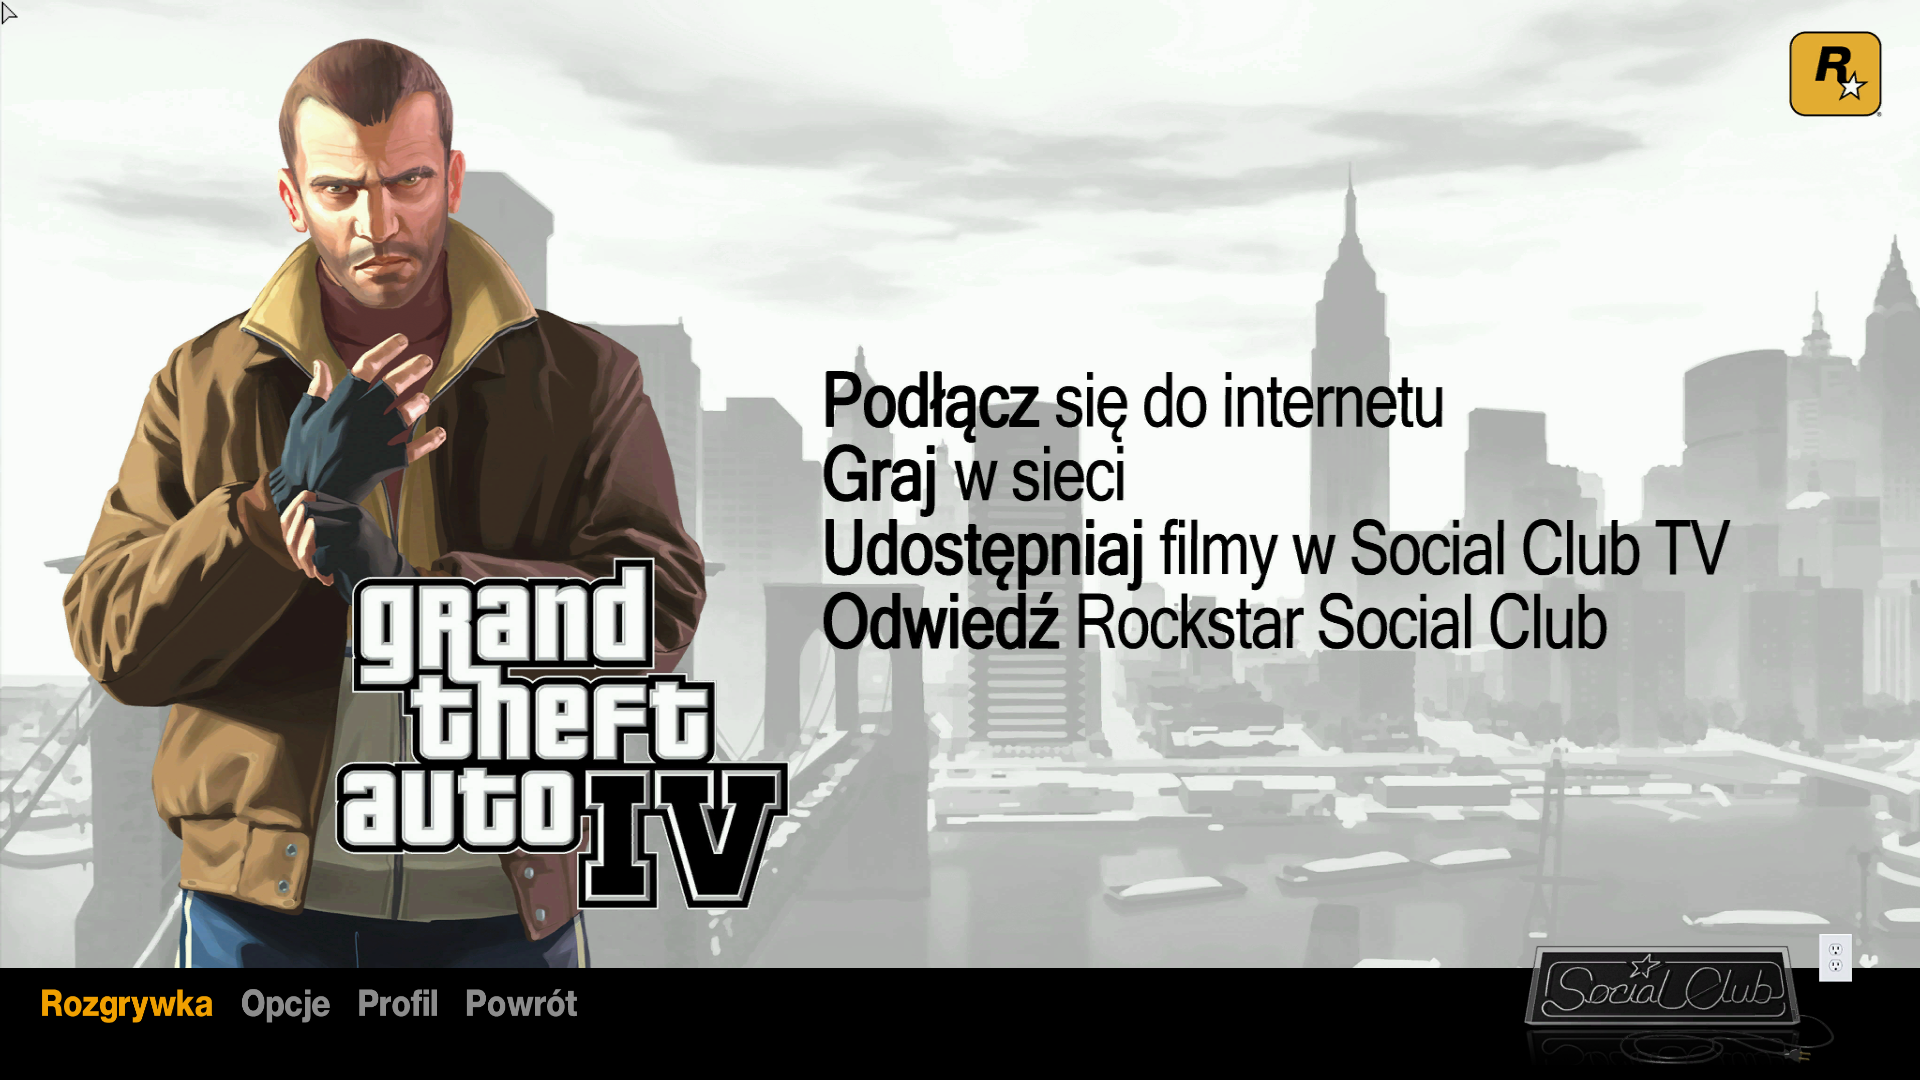 Grand-Theft-Auto-4-Screenshot-2020-08-03